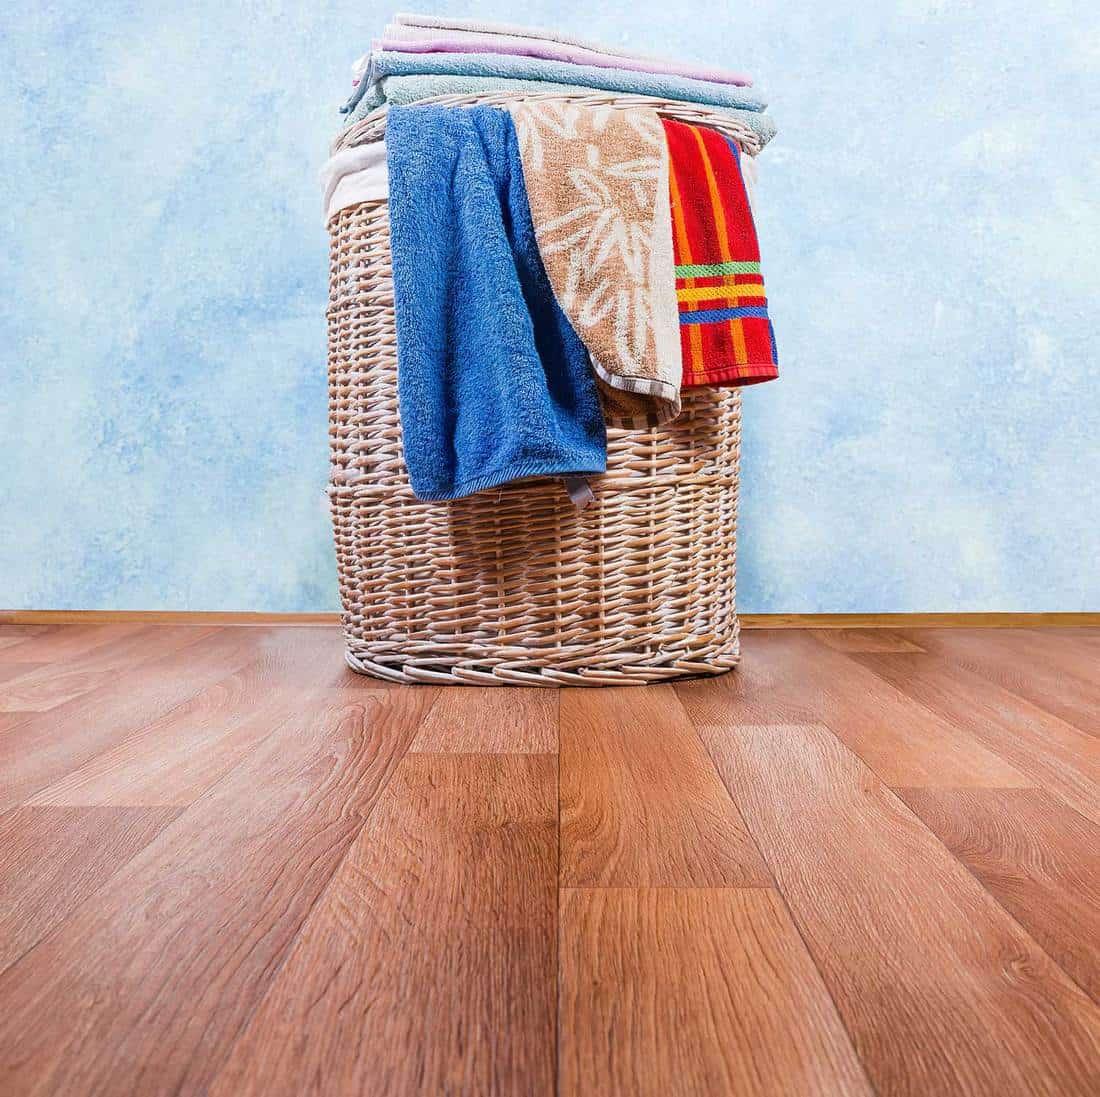 How To Store Blankets 5 Easy Methods Home Decor Bliss